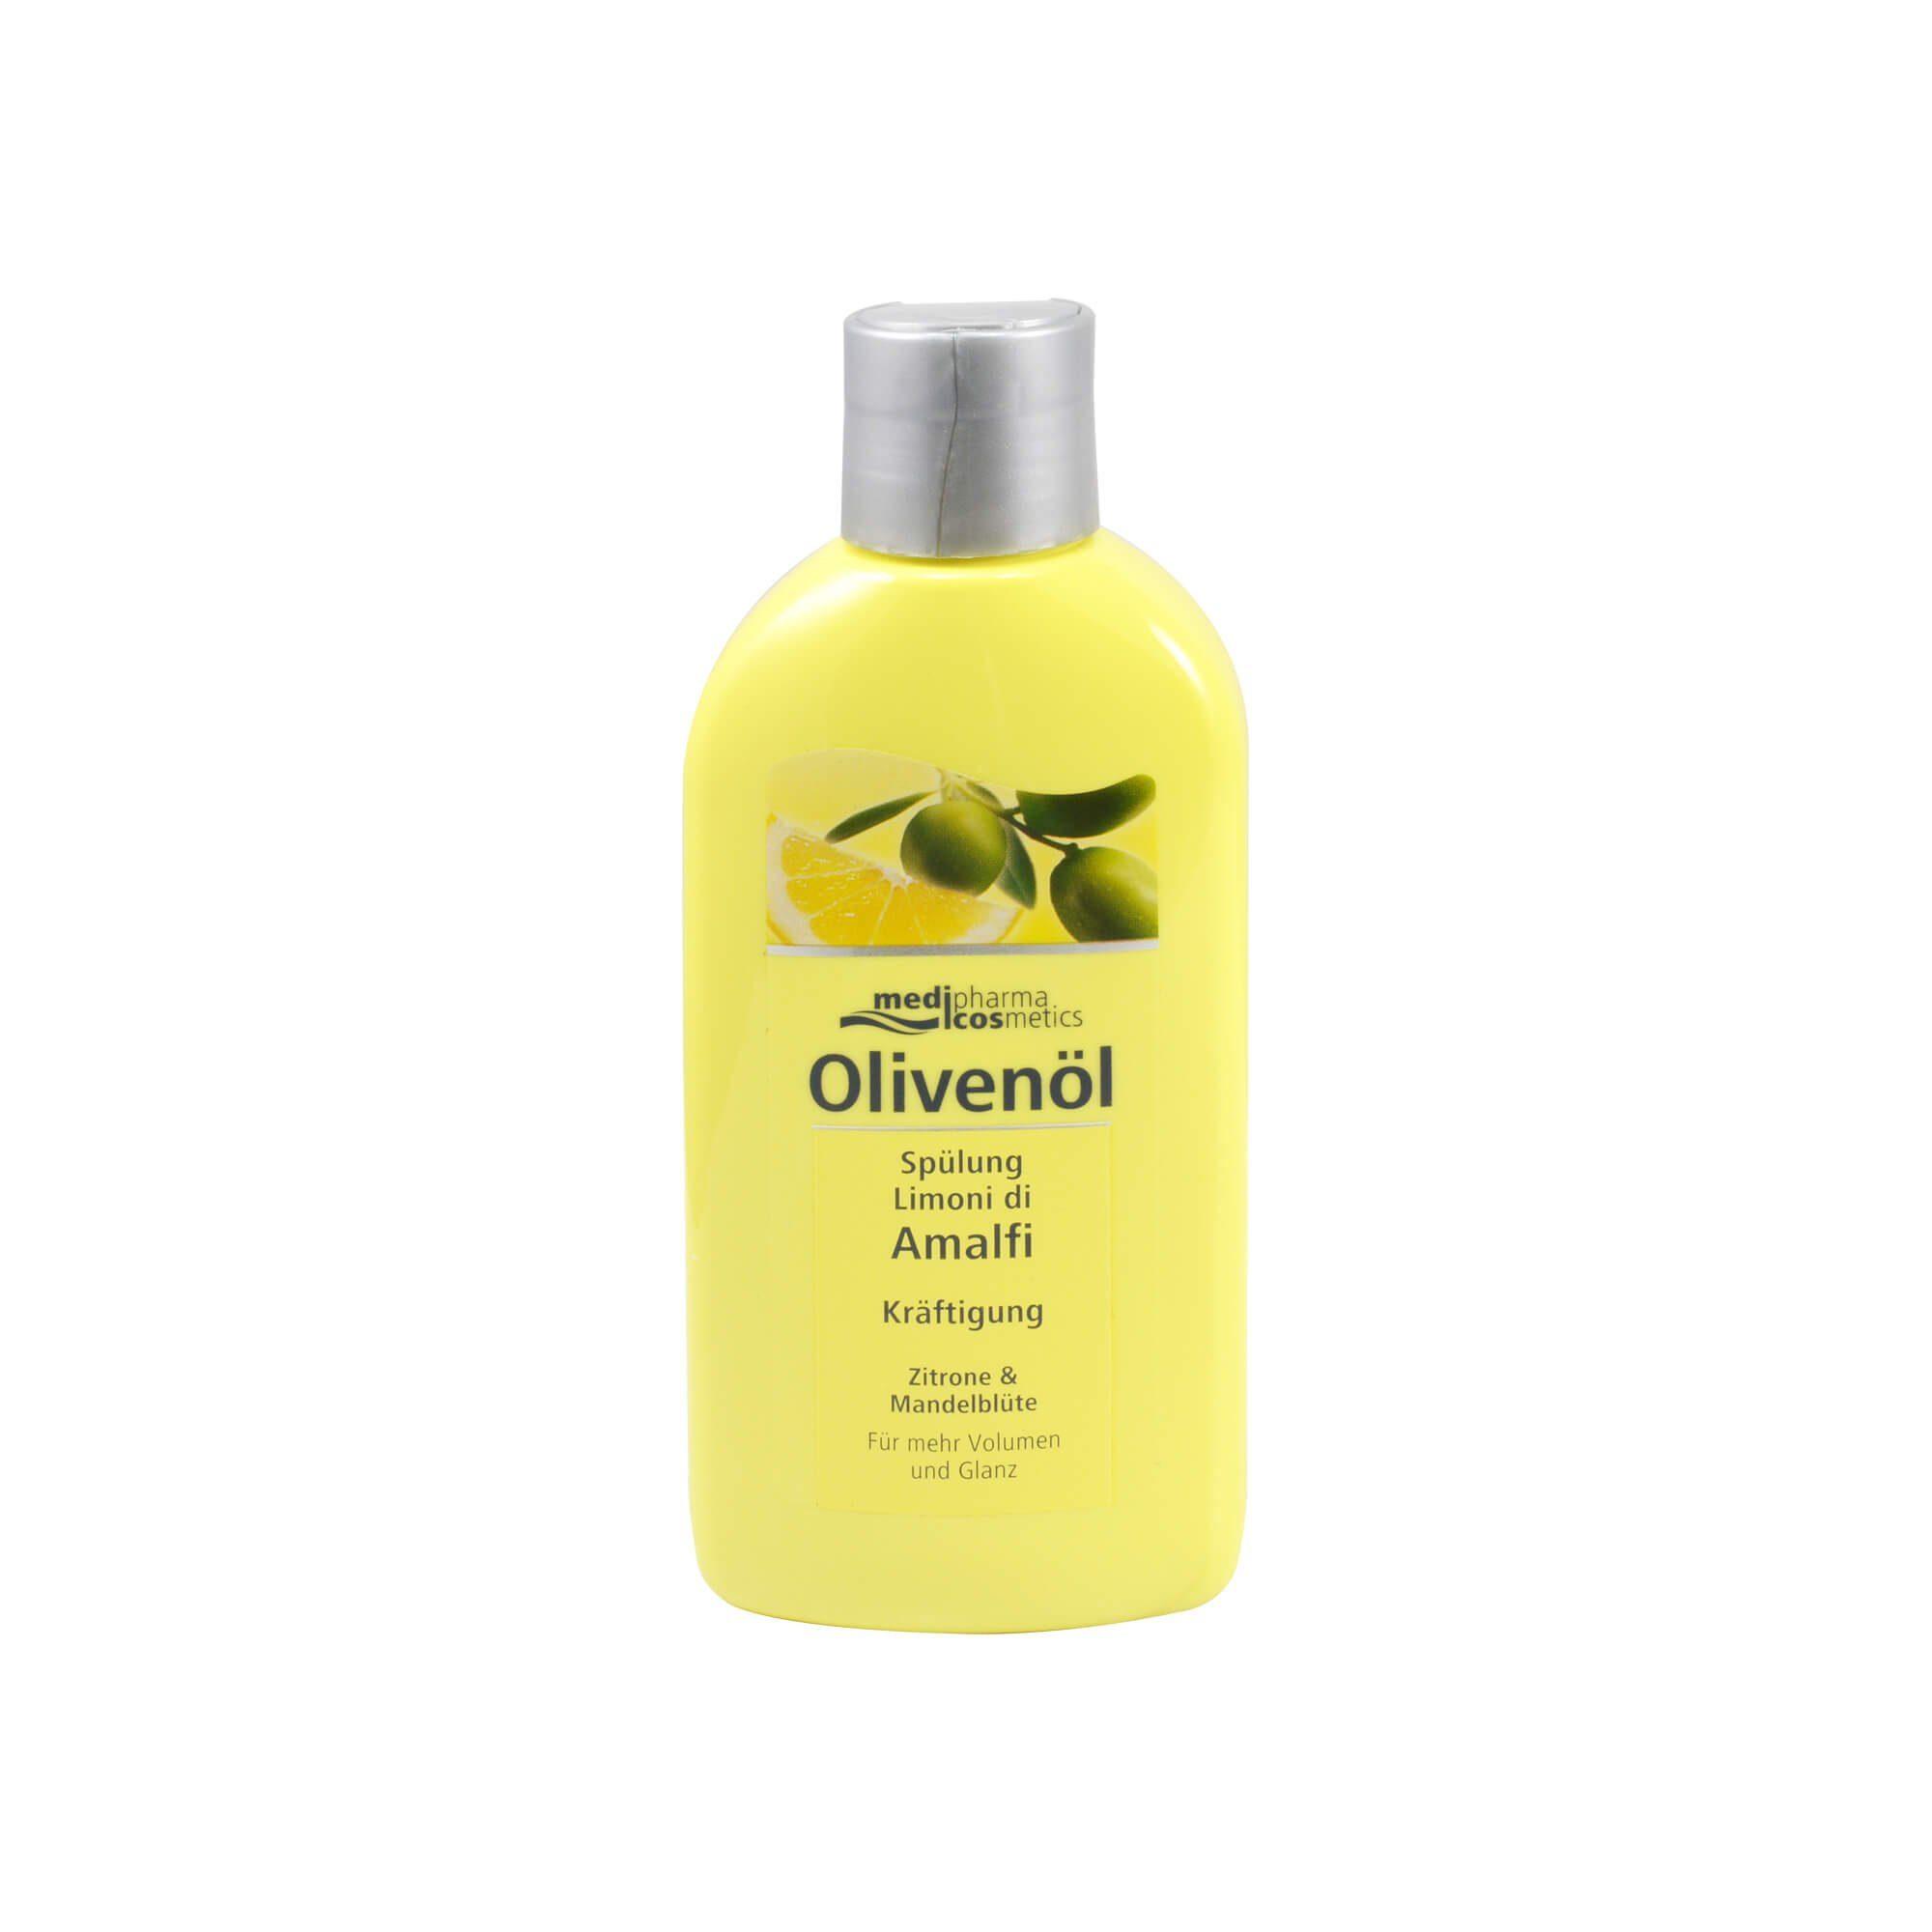 Olivenöl Spülung Limoni di Amalfi Kräftigung , 200 ml